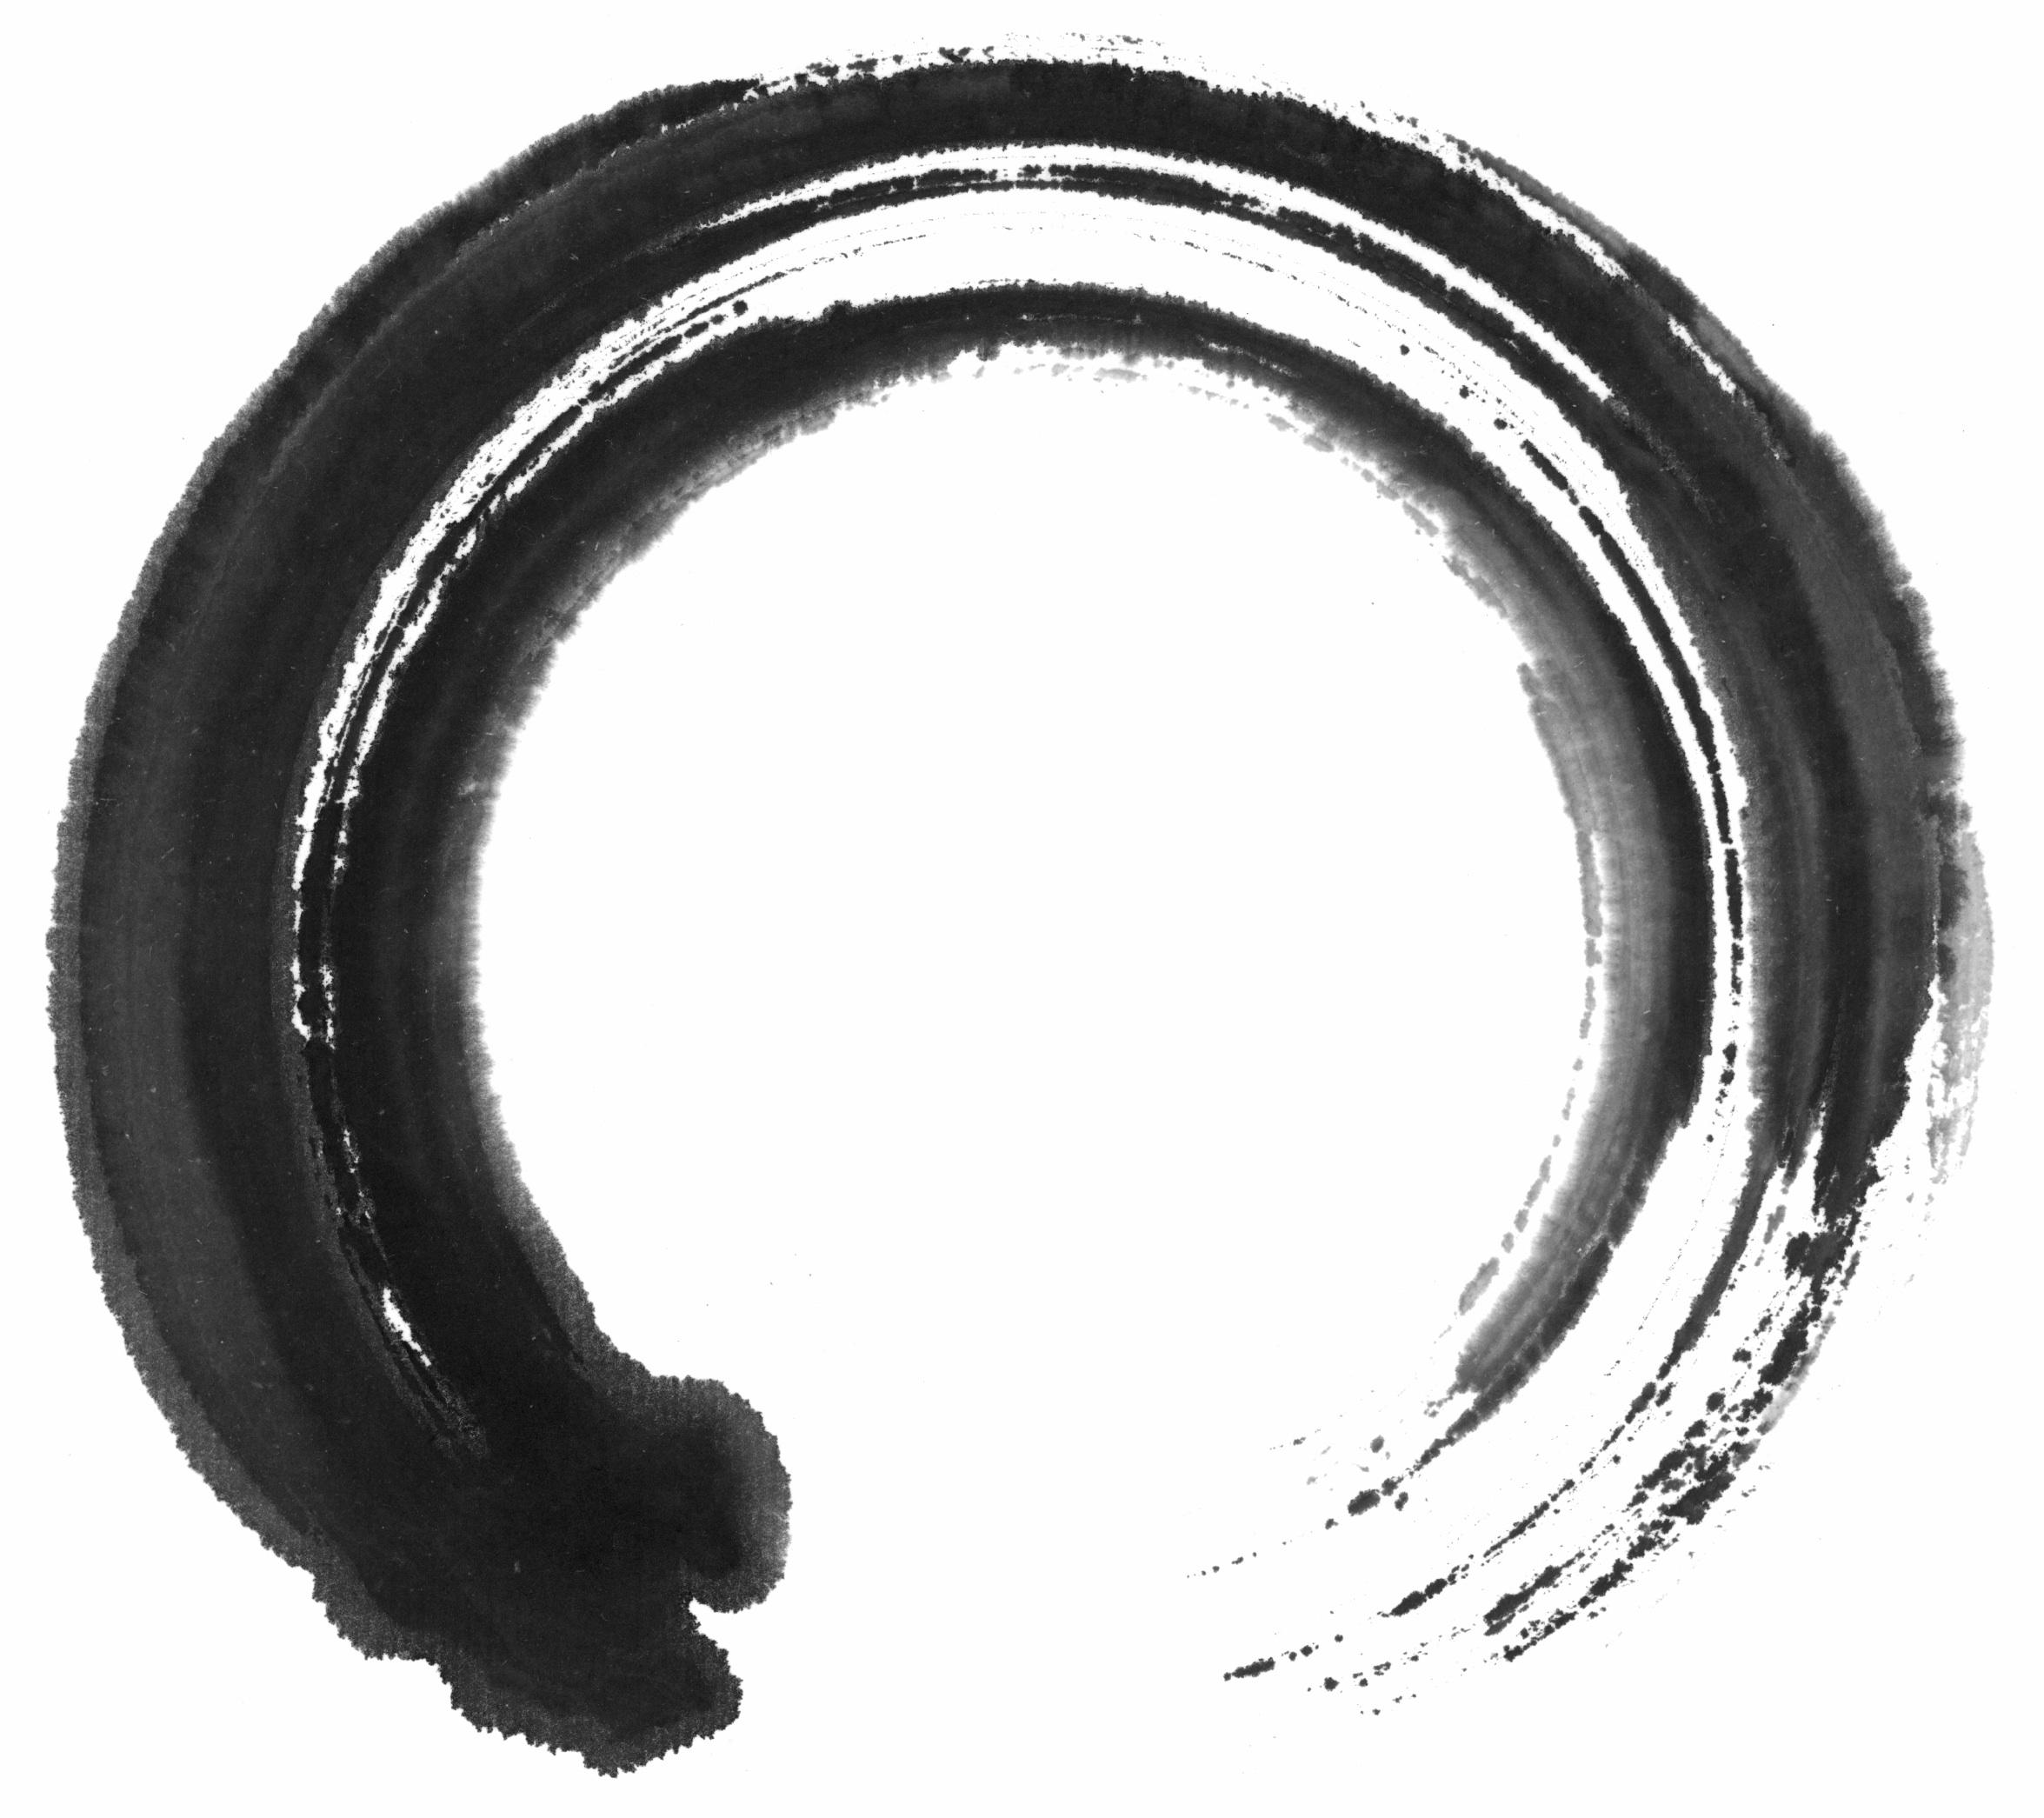 trader-chuyen-nghiep-xu-ly-lo-nhu-the-nao-traderviet-1.